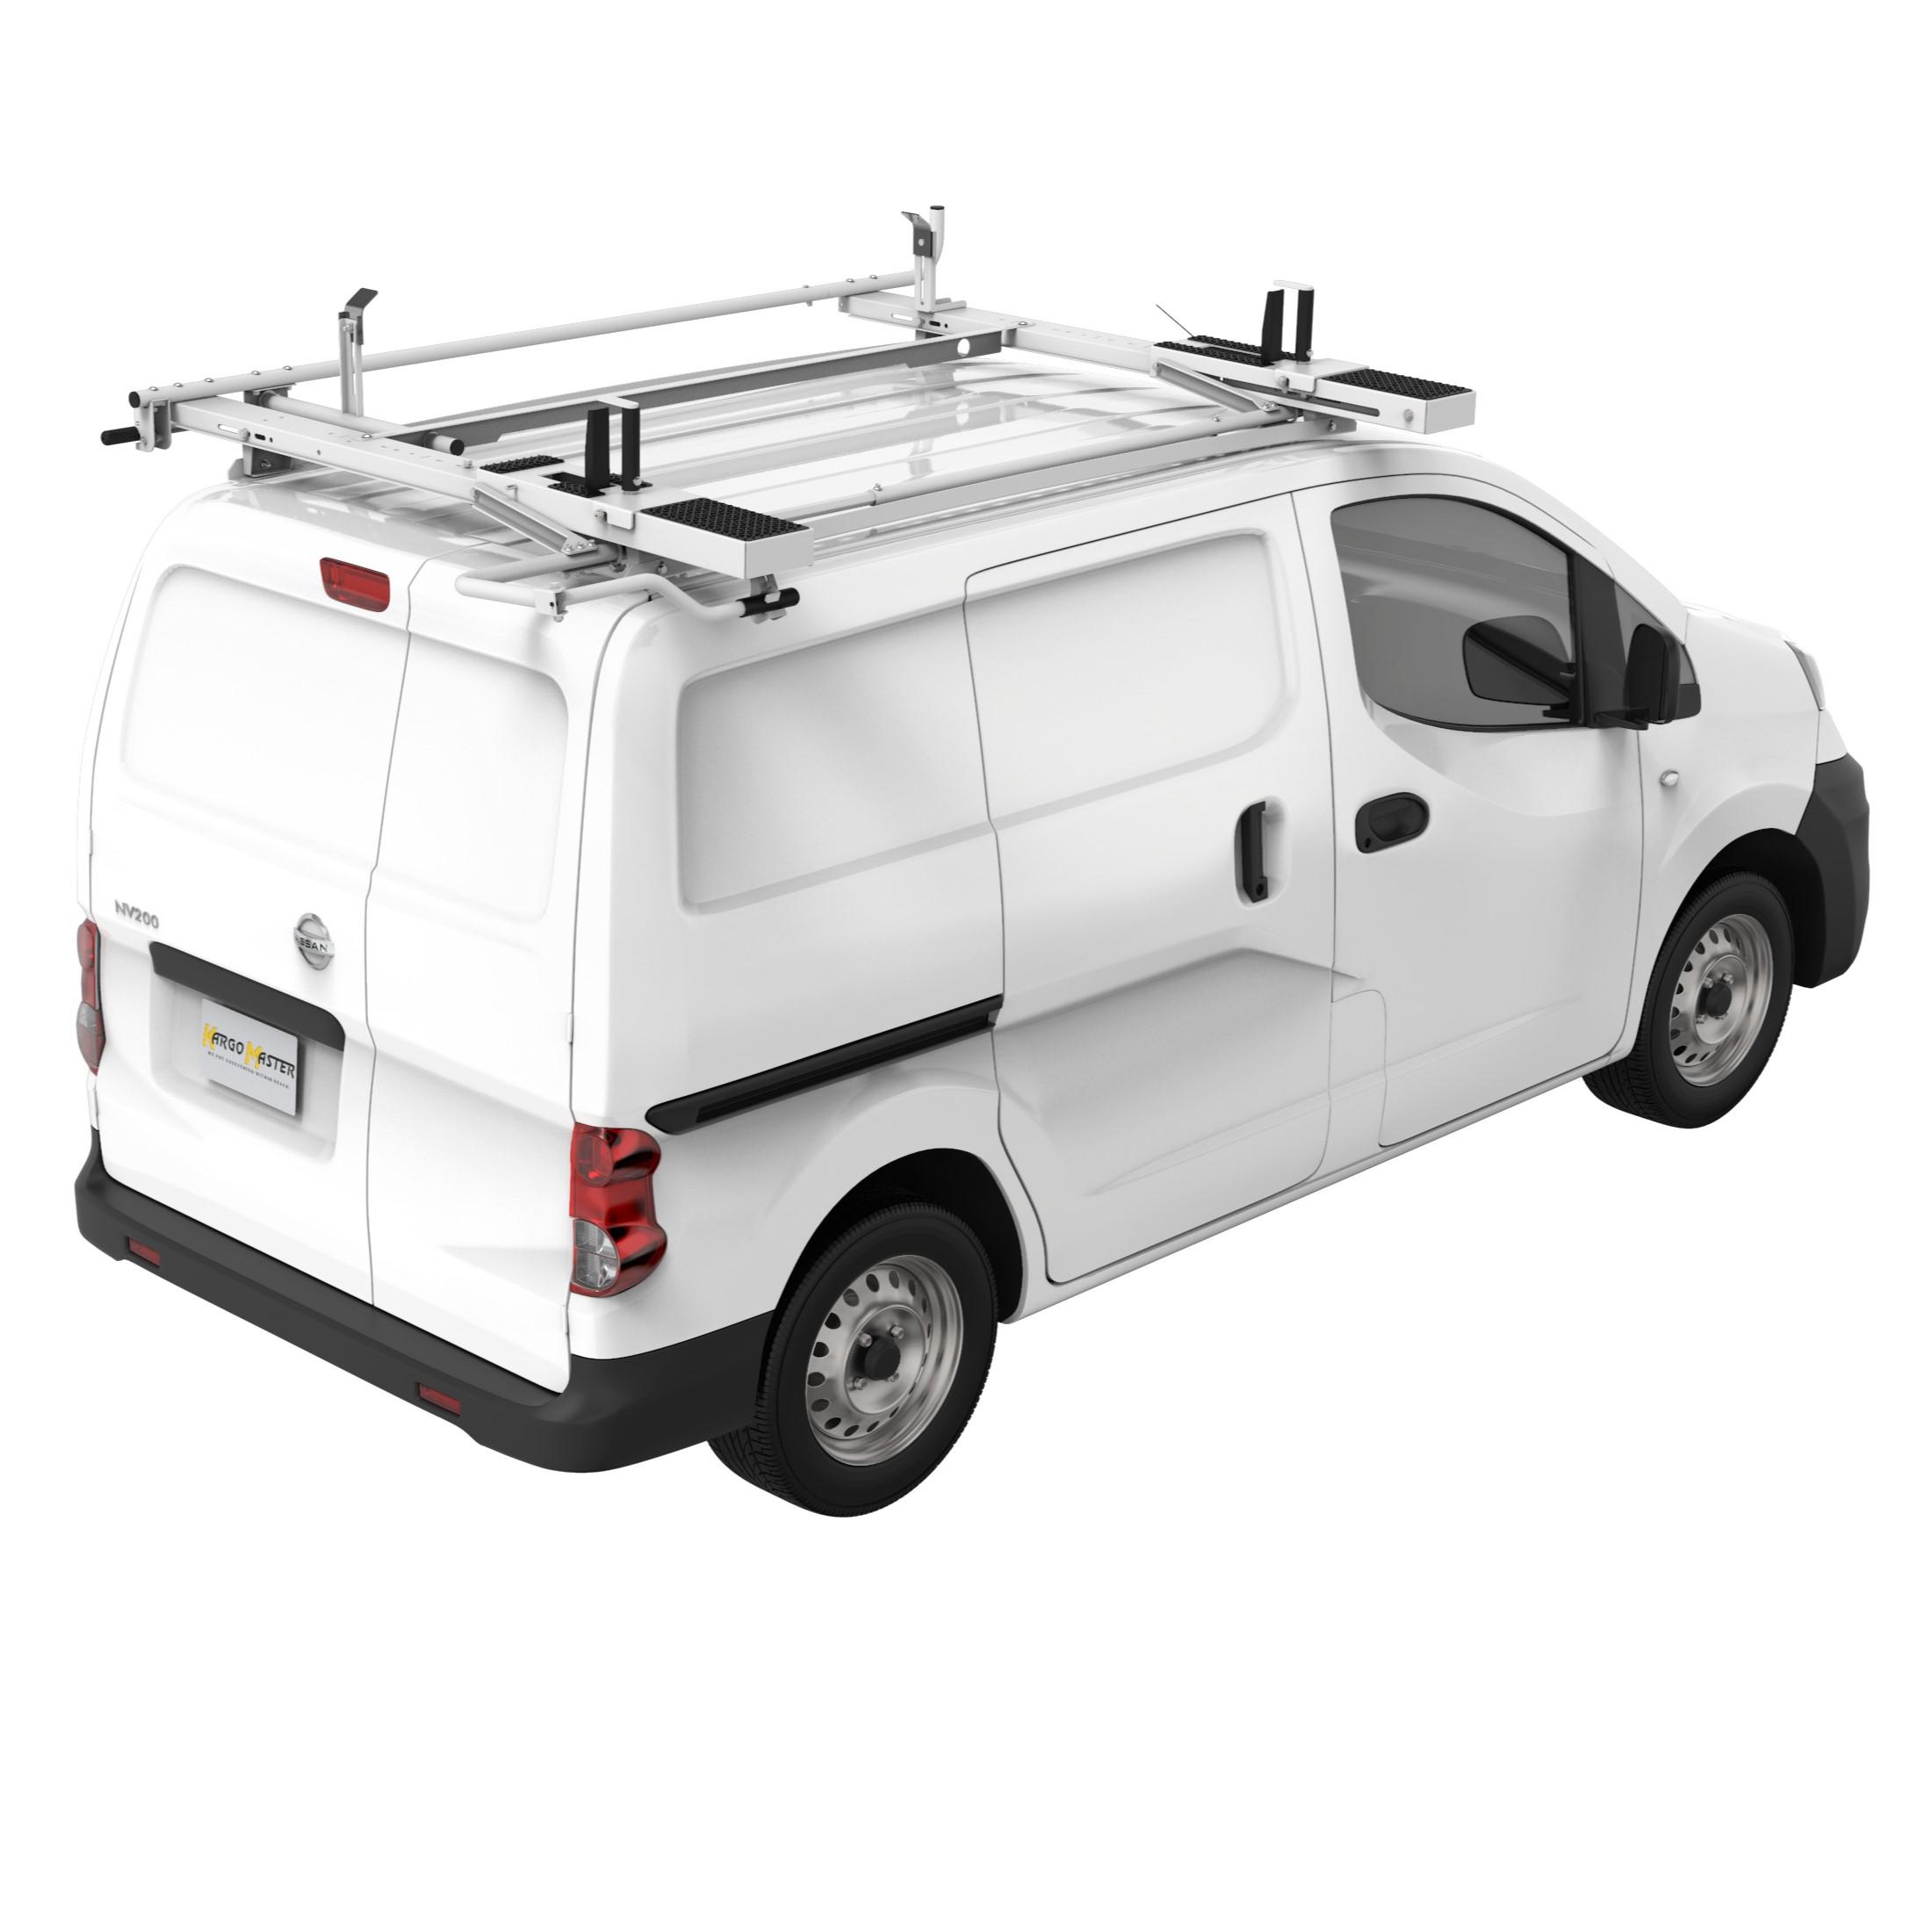 drop down ladder rack for compact vans including metris